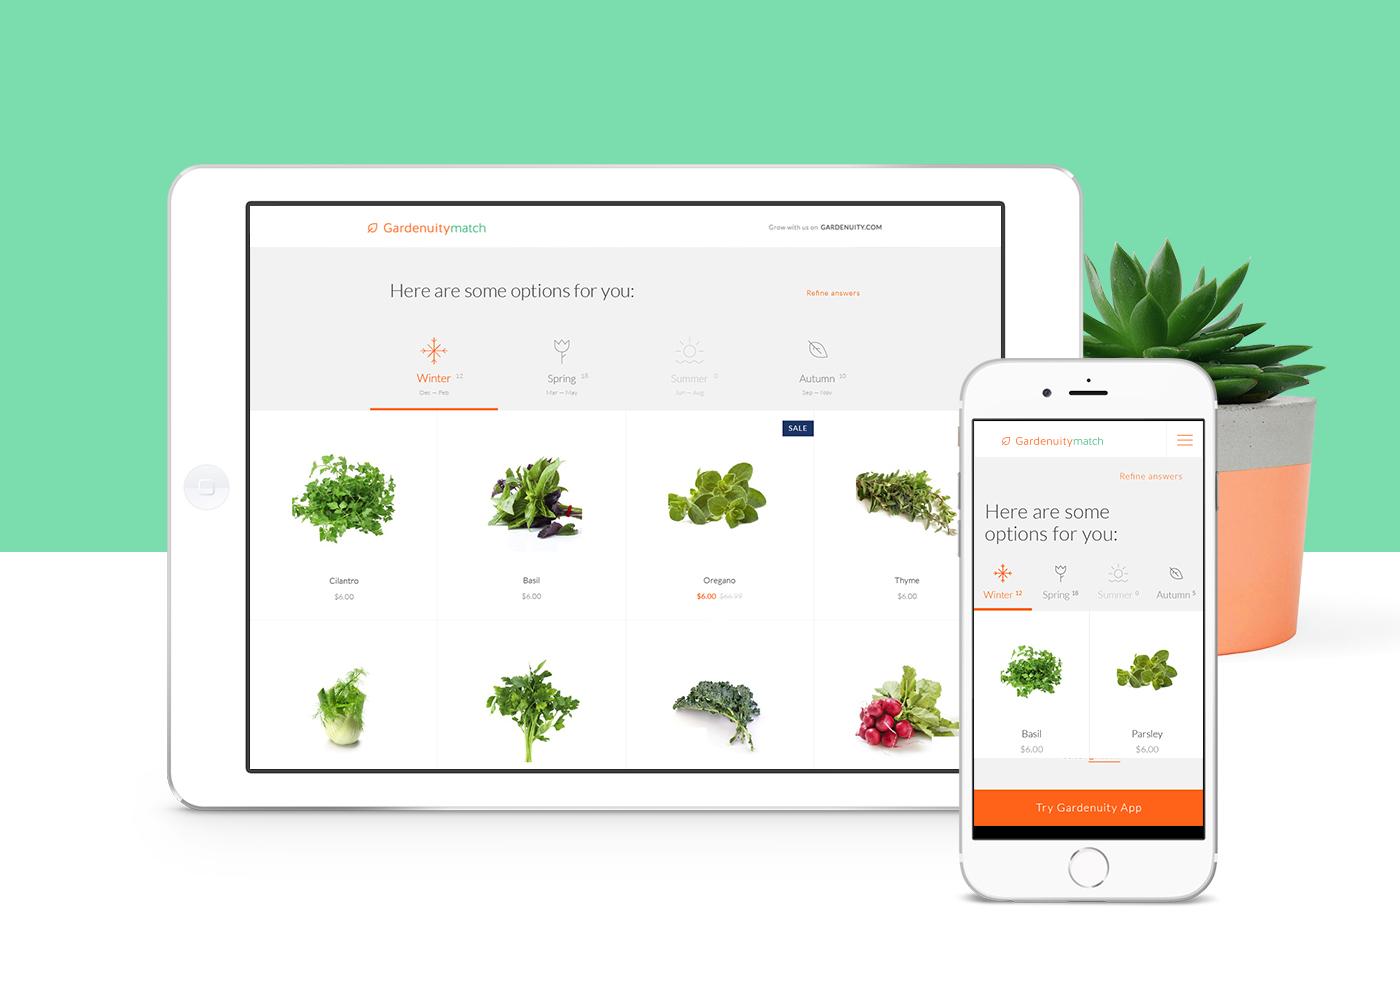 Gardenuity Match website by Gen Design Studio